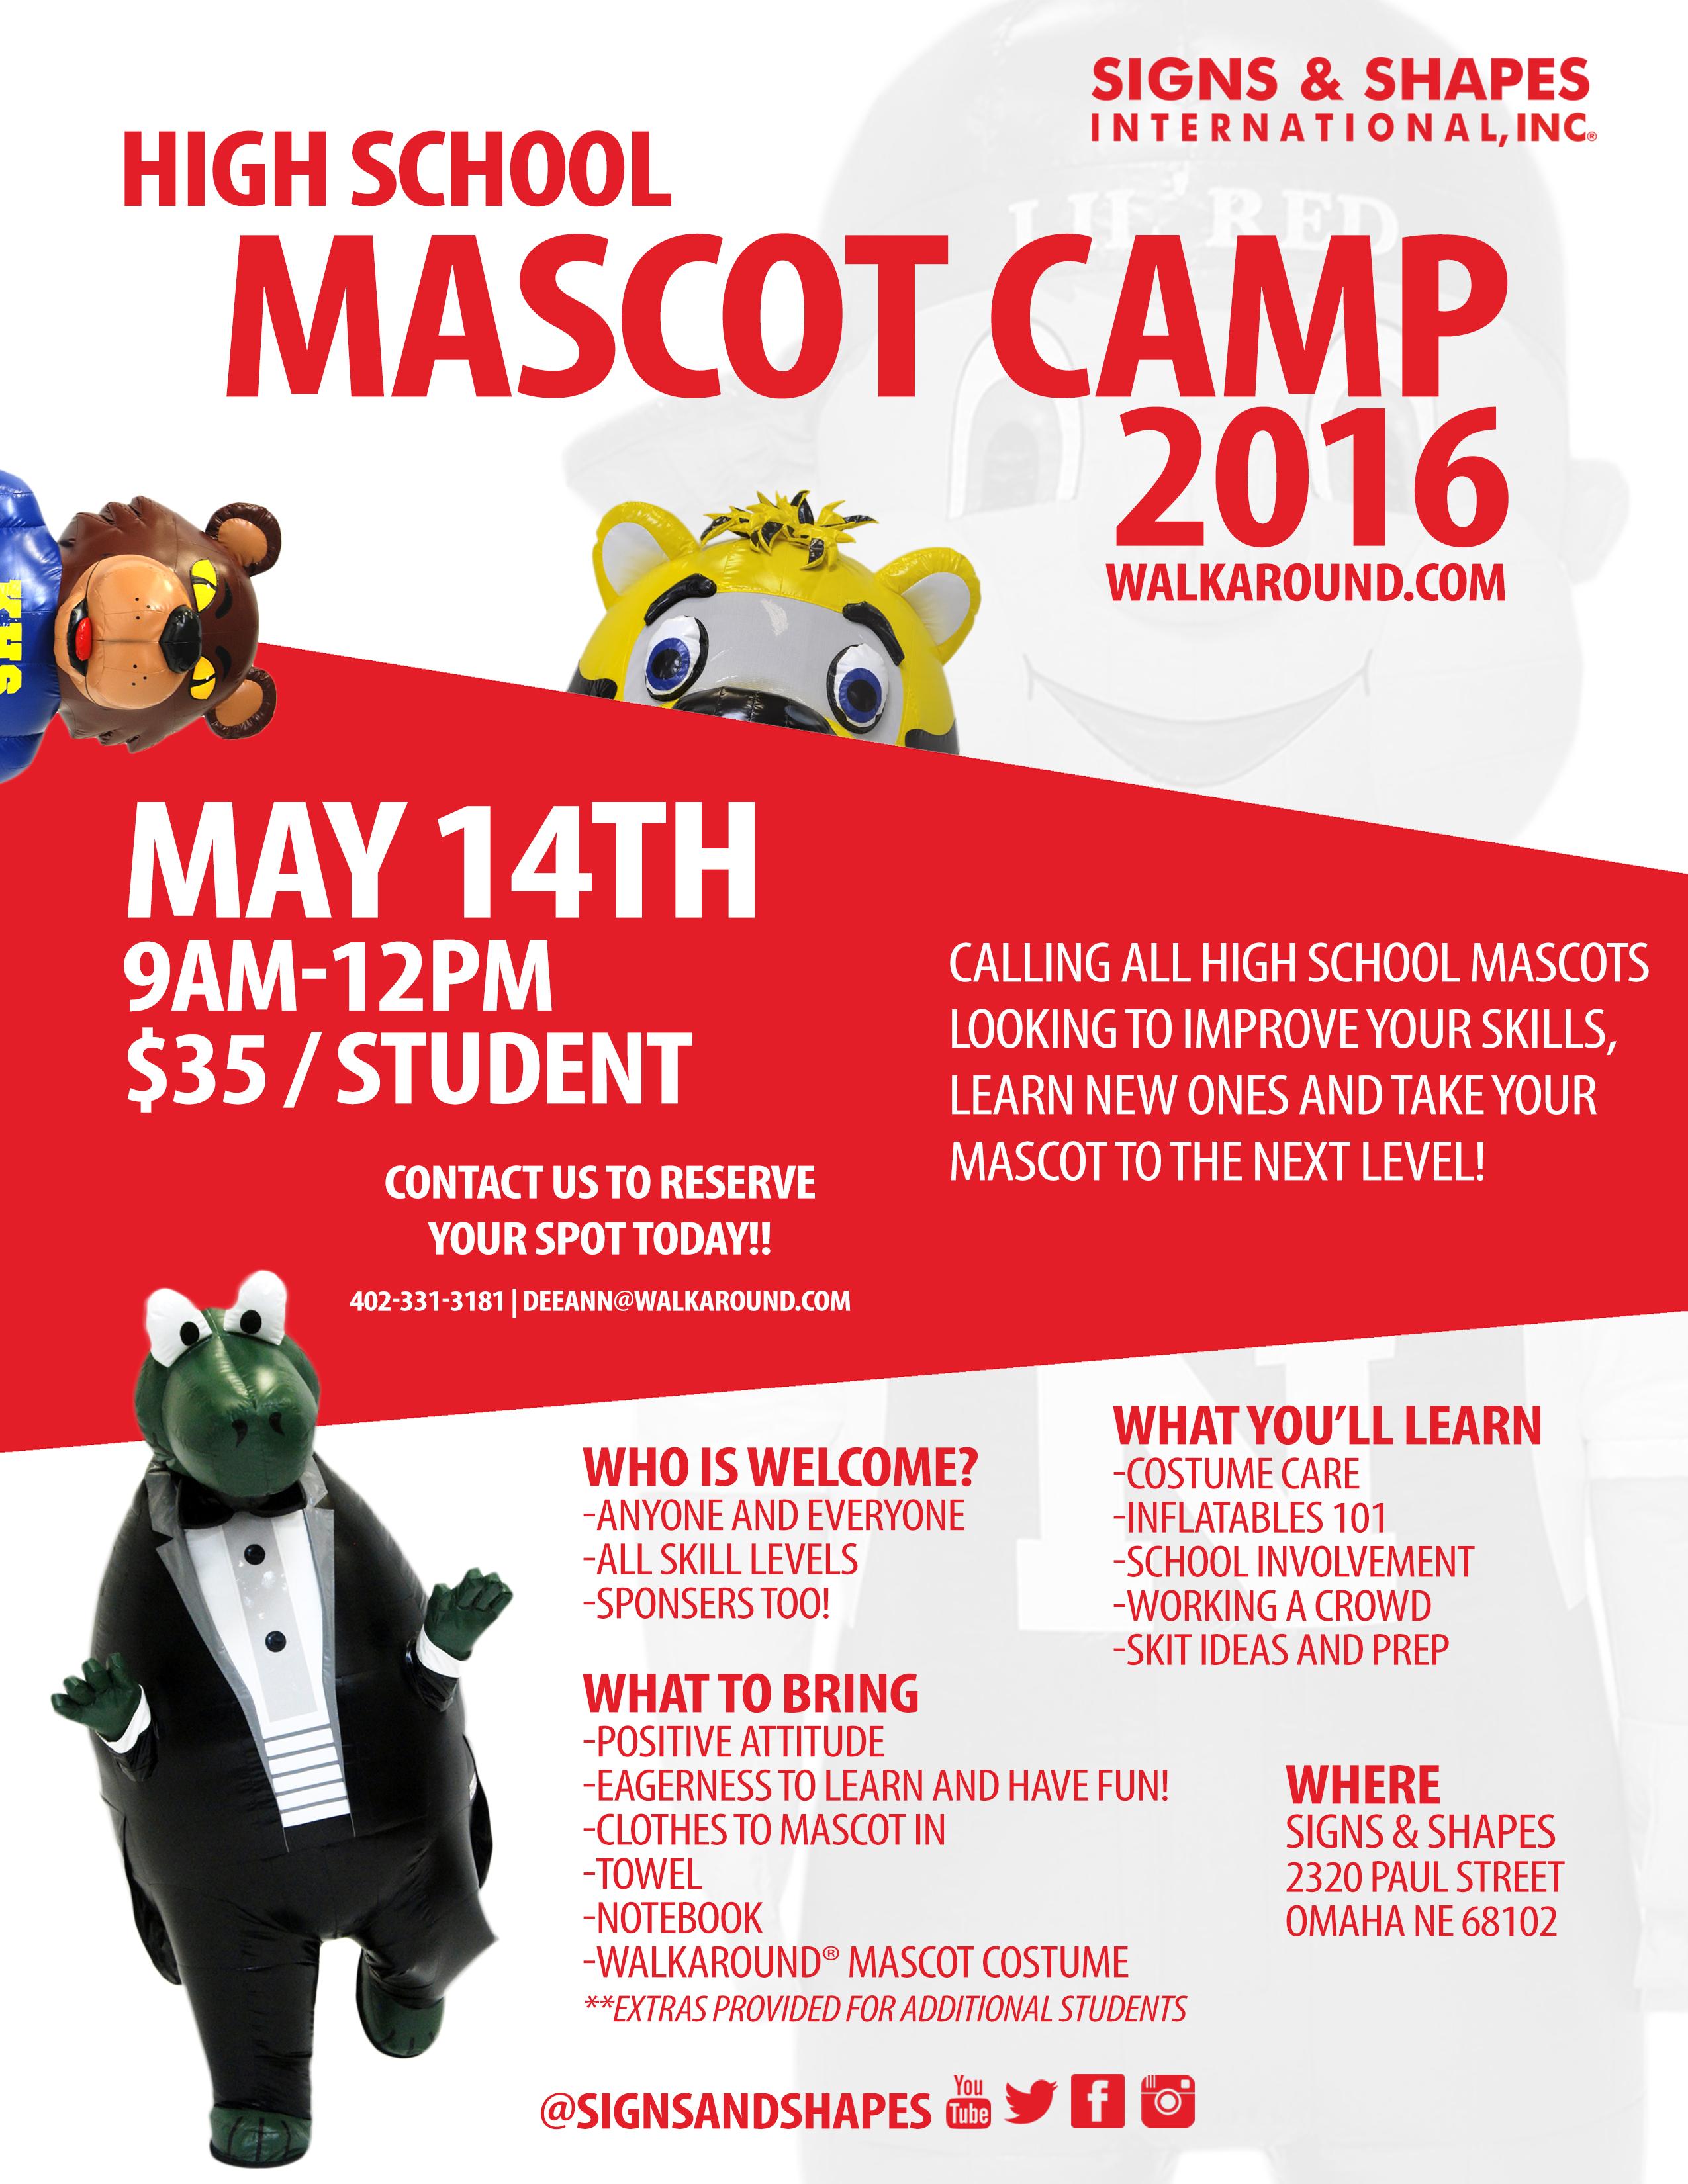 High School Mascot Camp 2016